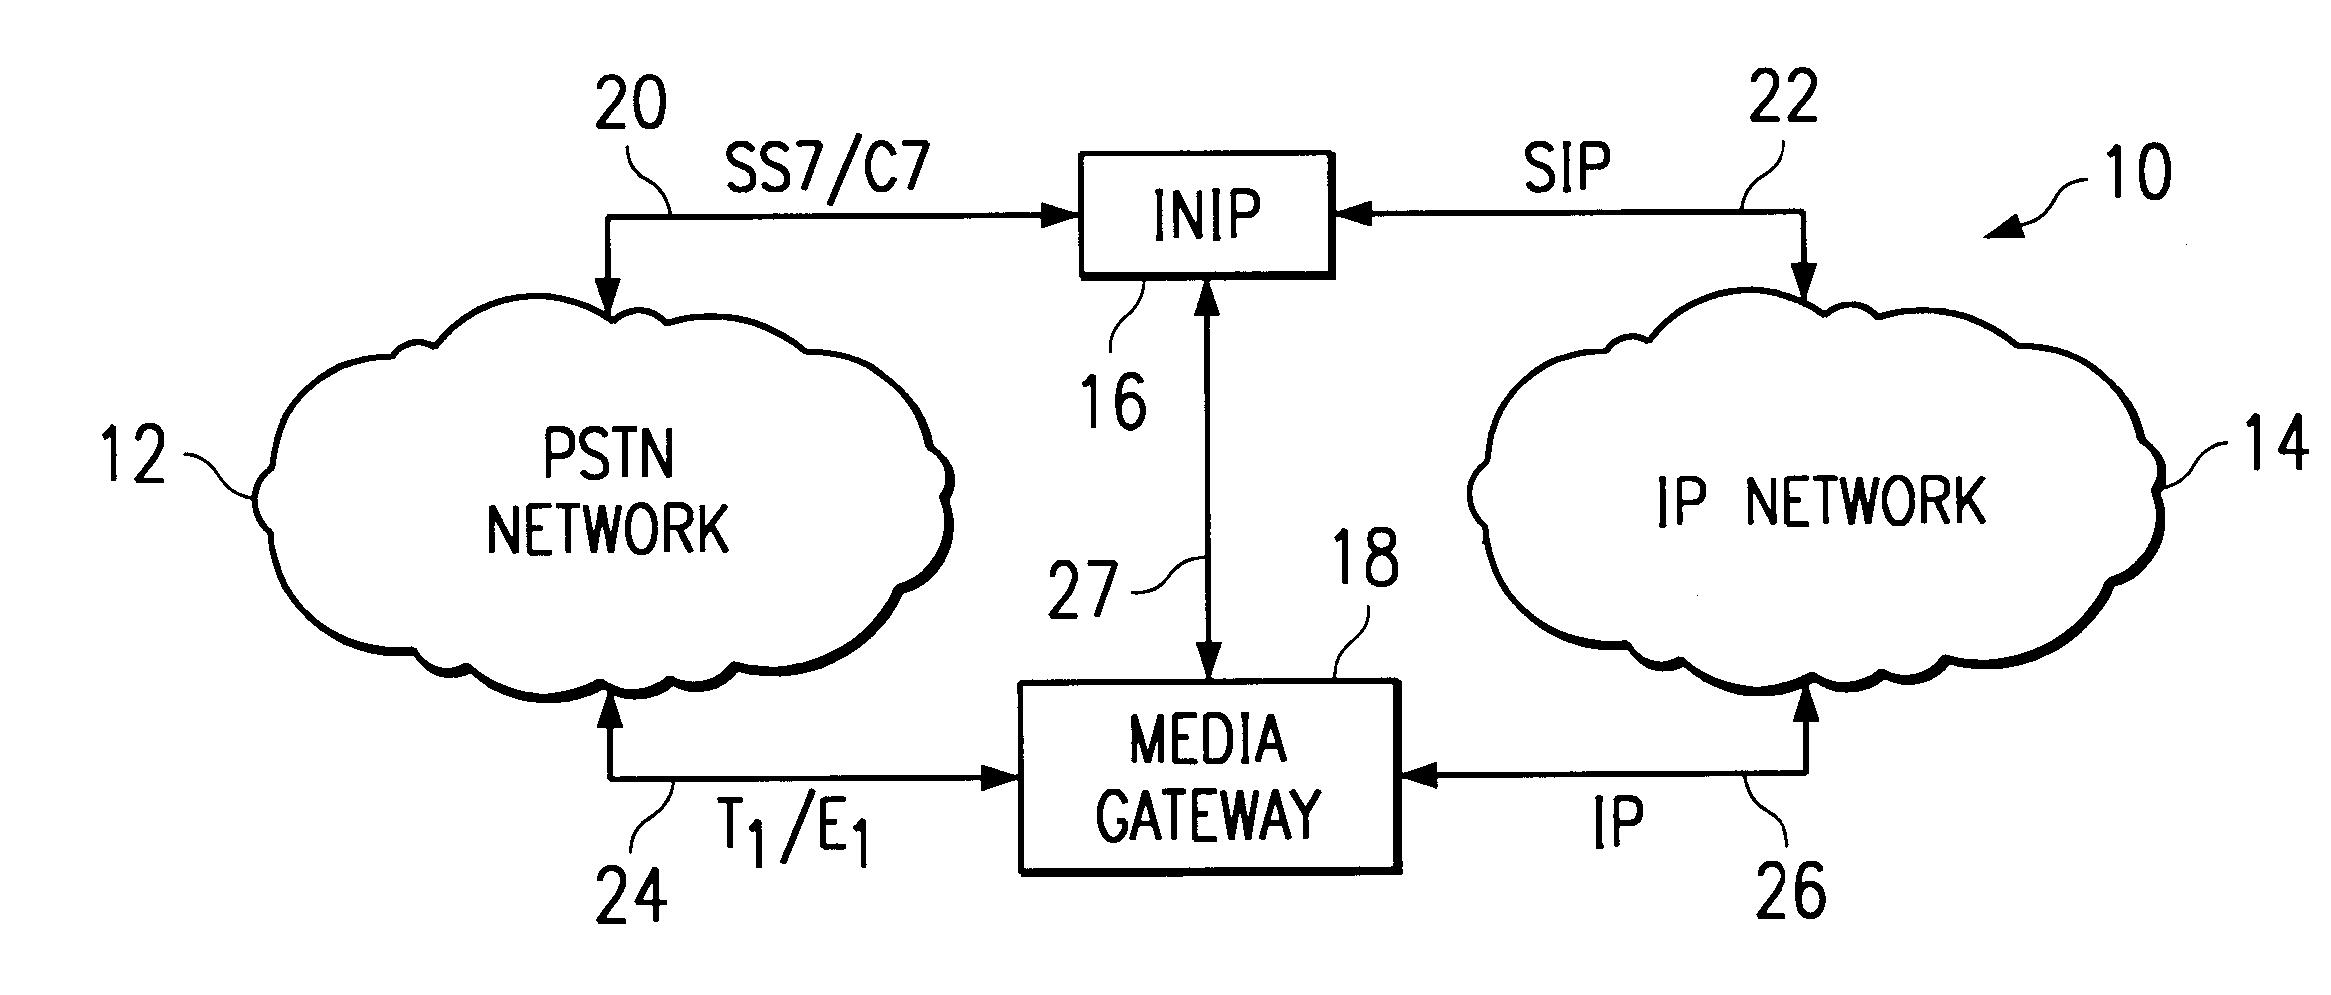 Patent US 6,775,269 B1